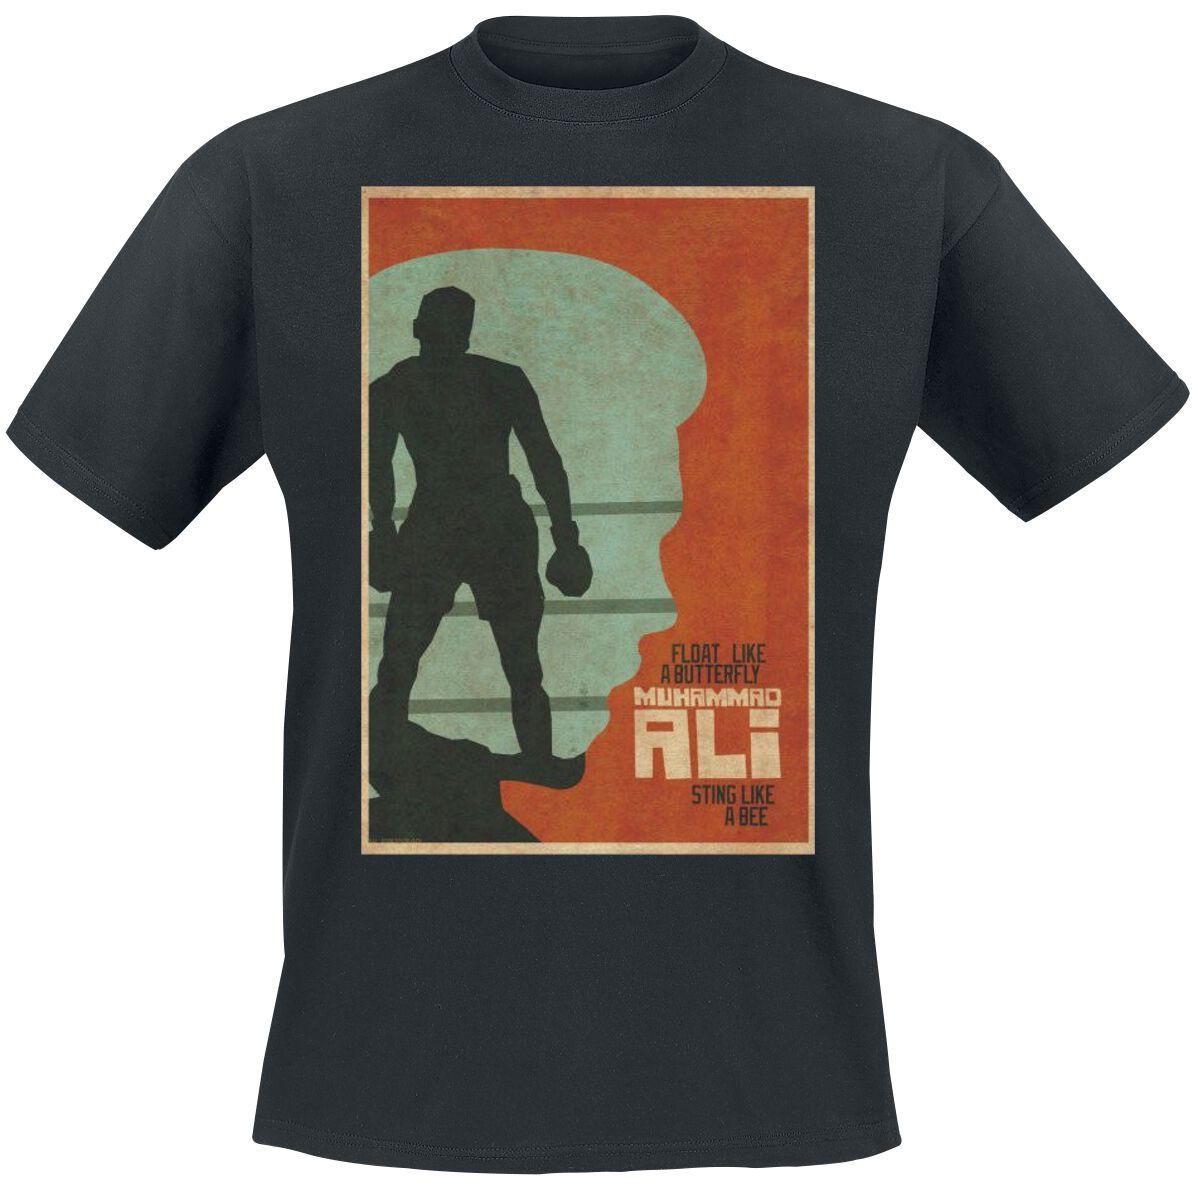 Merch dla Fanów - Koszulki - T-Shirt Muhammad Ali Float Like A Butterfly, Sting Like A Bee T-Shirt czarny - 356251